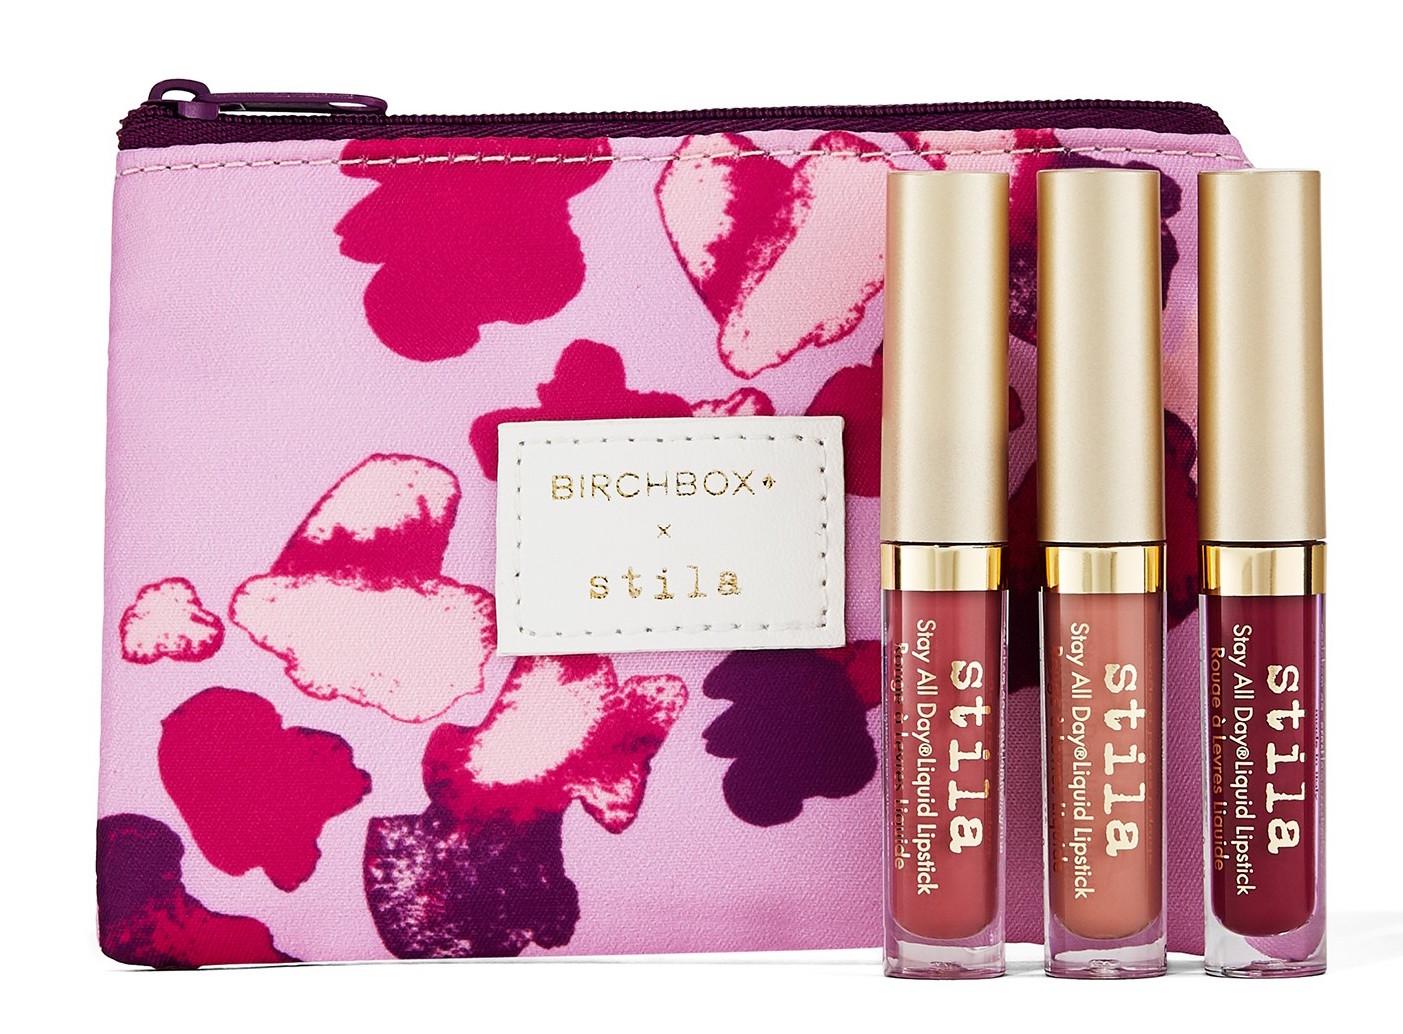 stila.stay-all-day-liquid-lipstick-trio.p_p.1500x1500.jpg